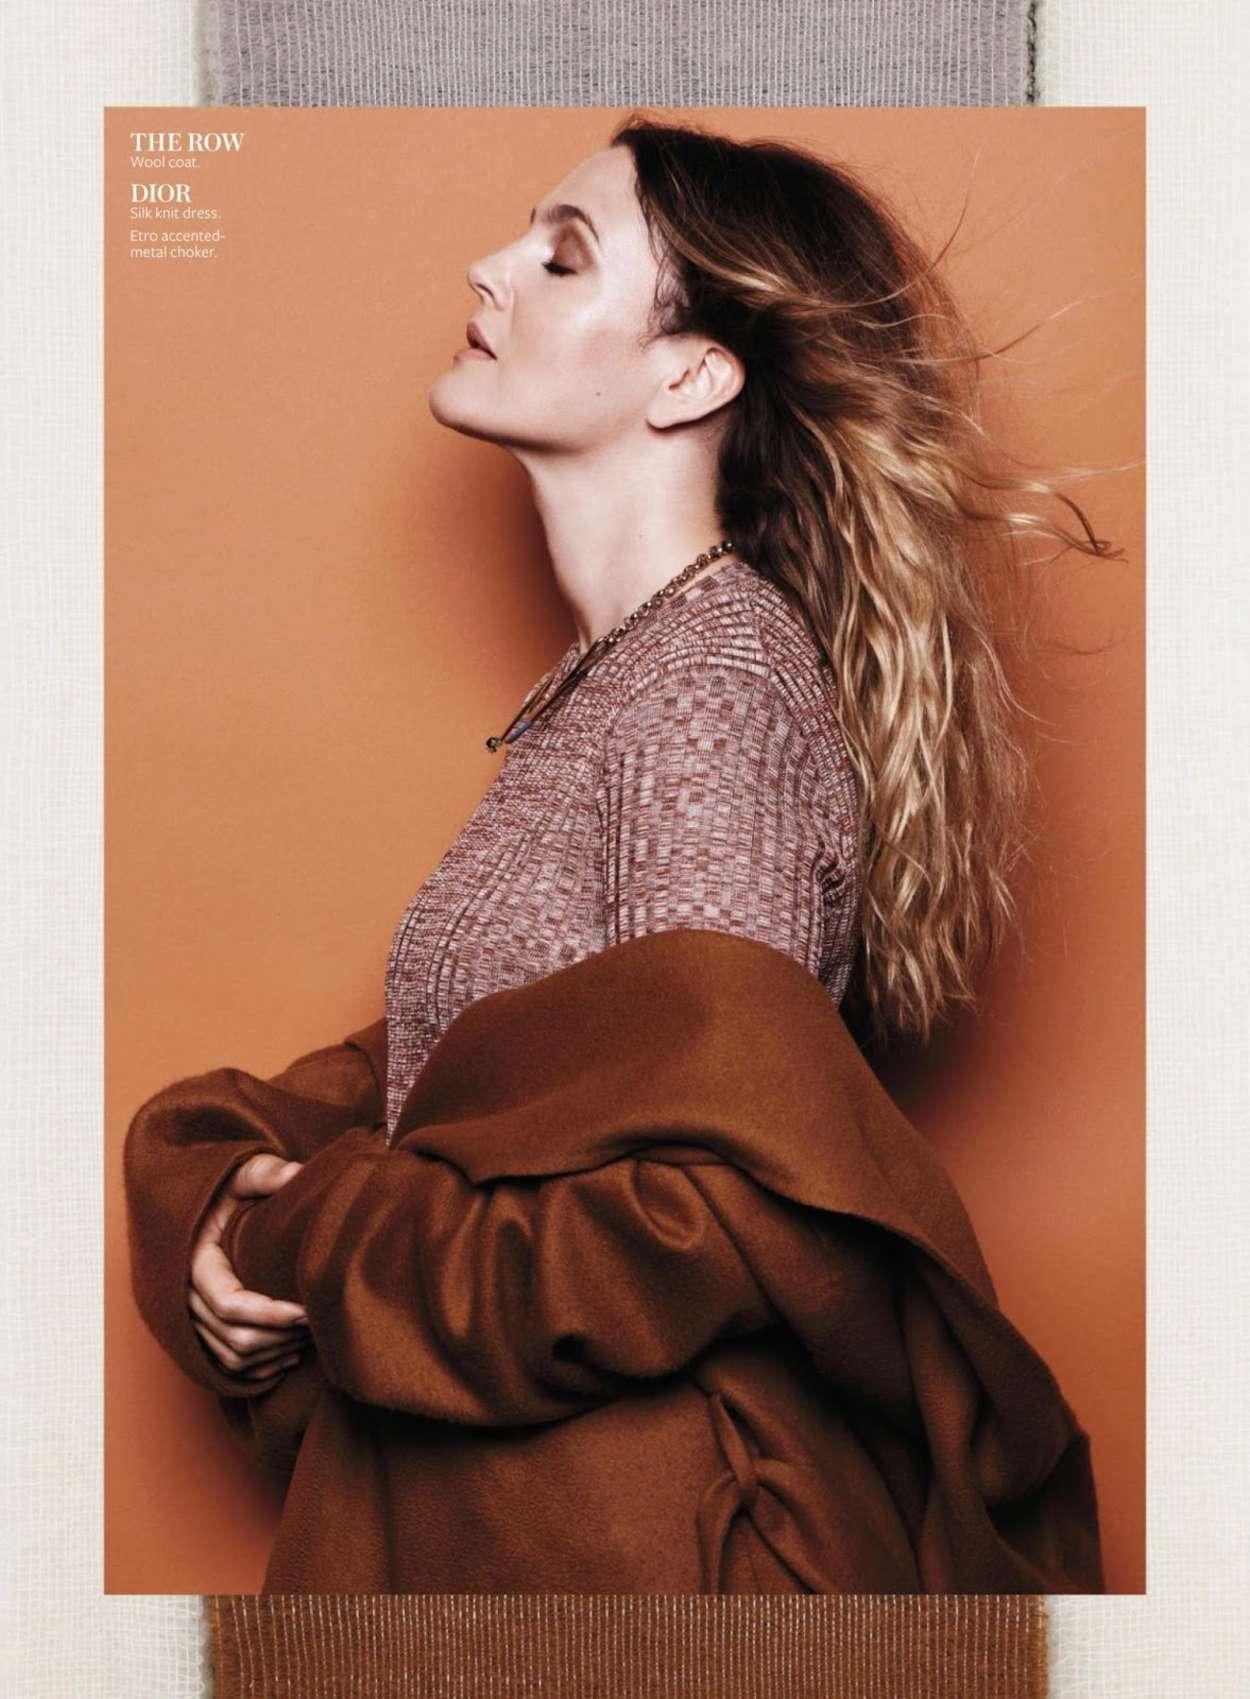 Drew Barrymore 2015 : Drew Barrymore: InStyle US 2015 -01